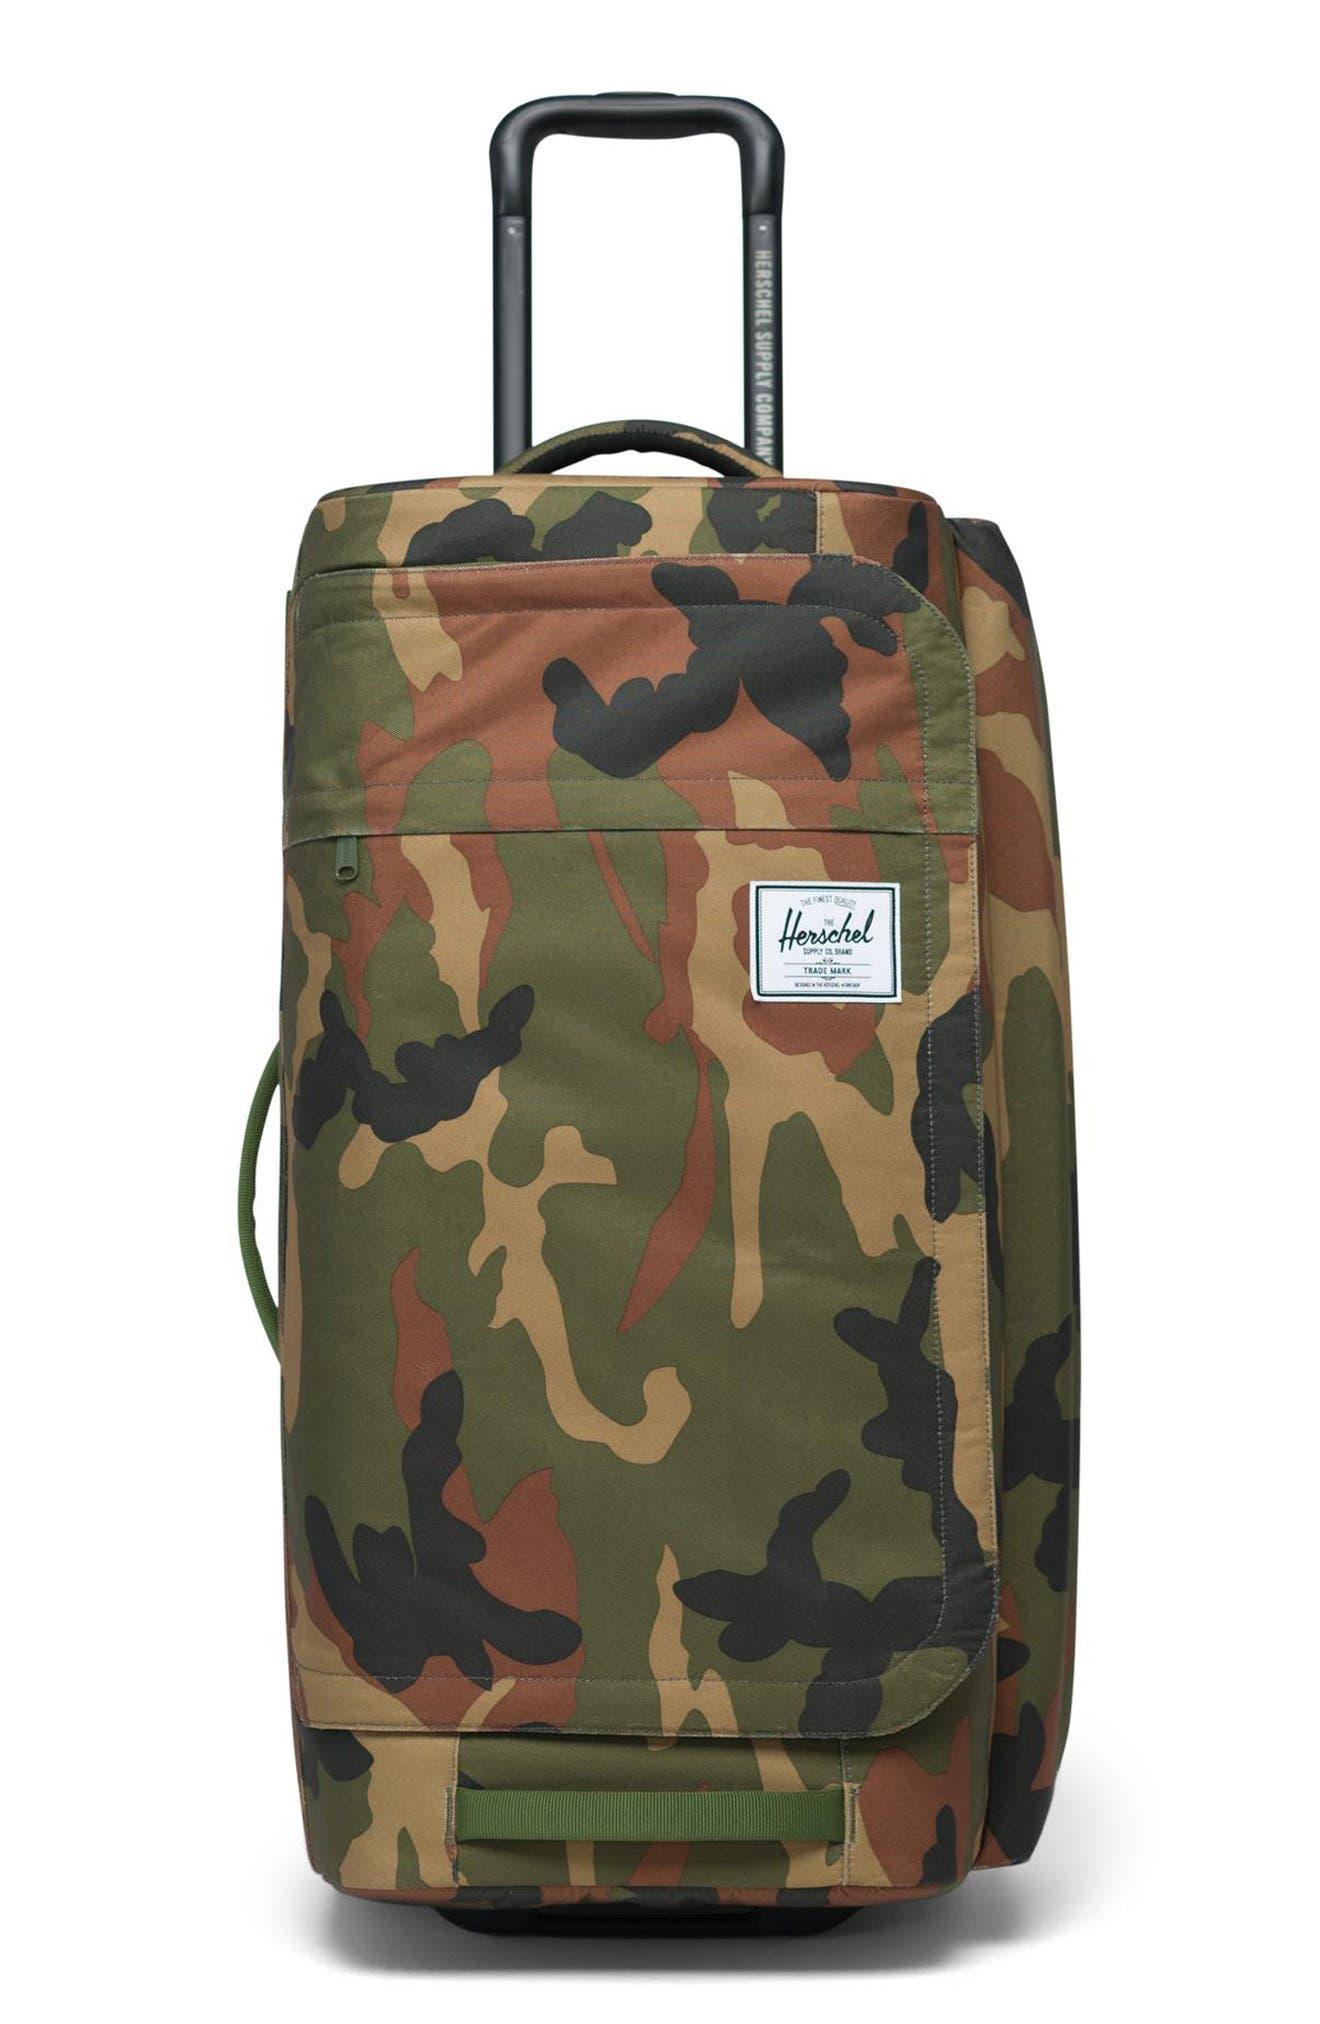 New Arrival. Herschel Supply Co. Wheelie Outfitter 24-Inch Duffel Bag In  Woodland Camo 58de9d3df4